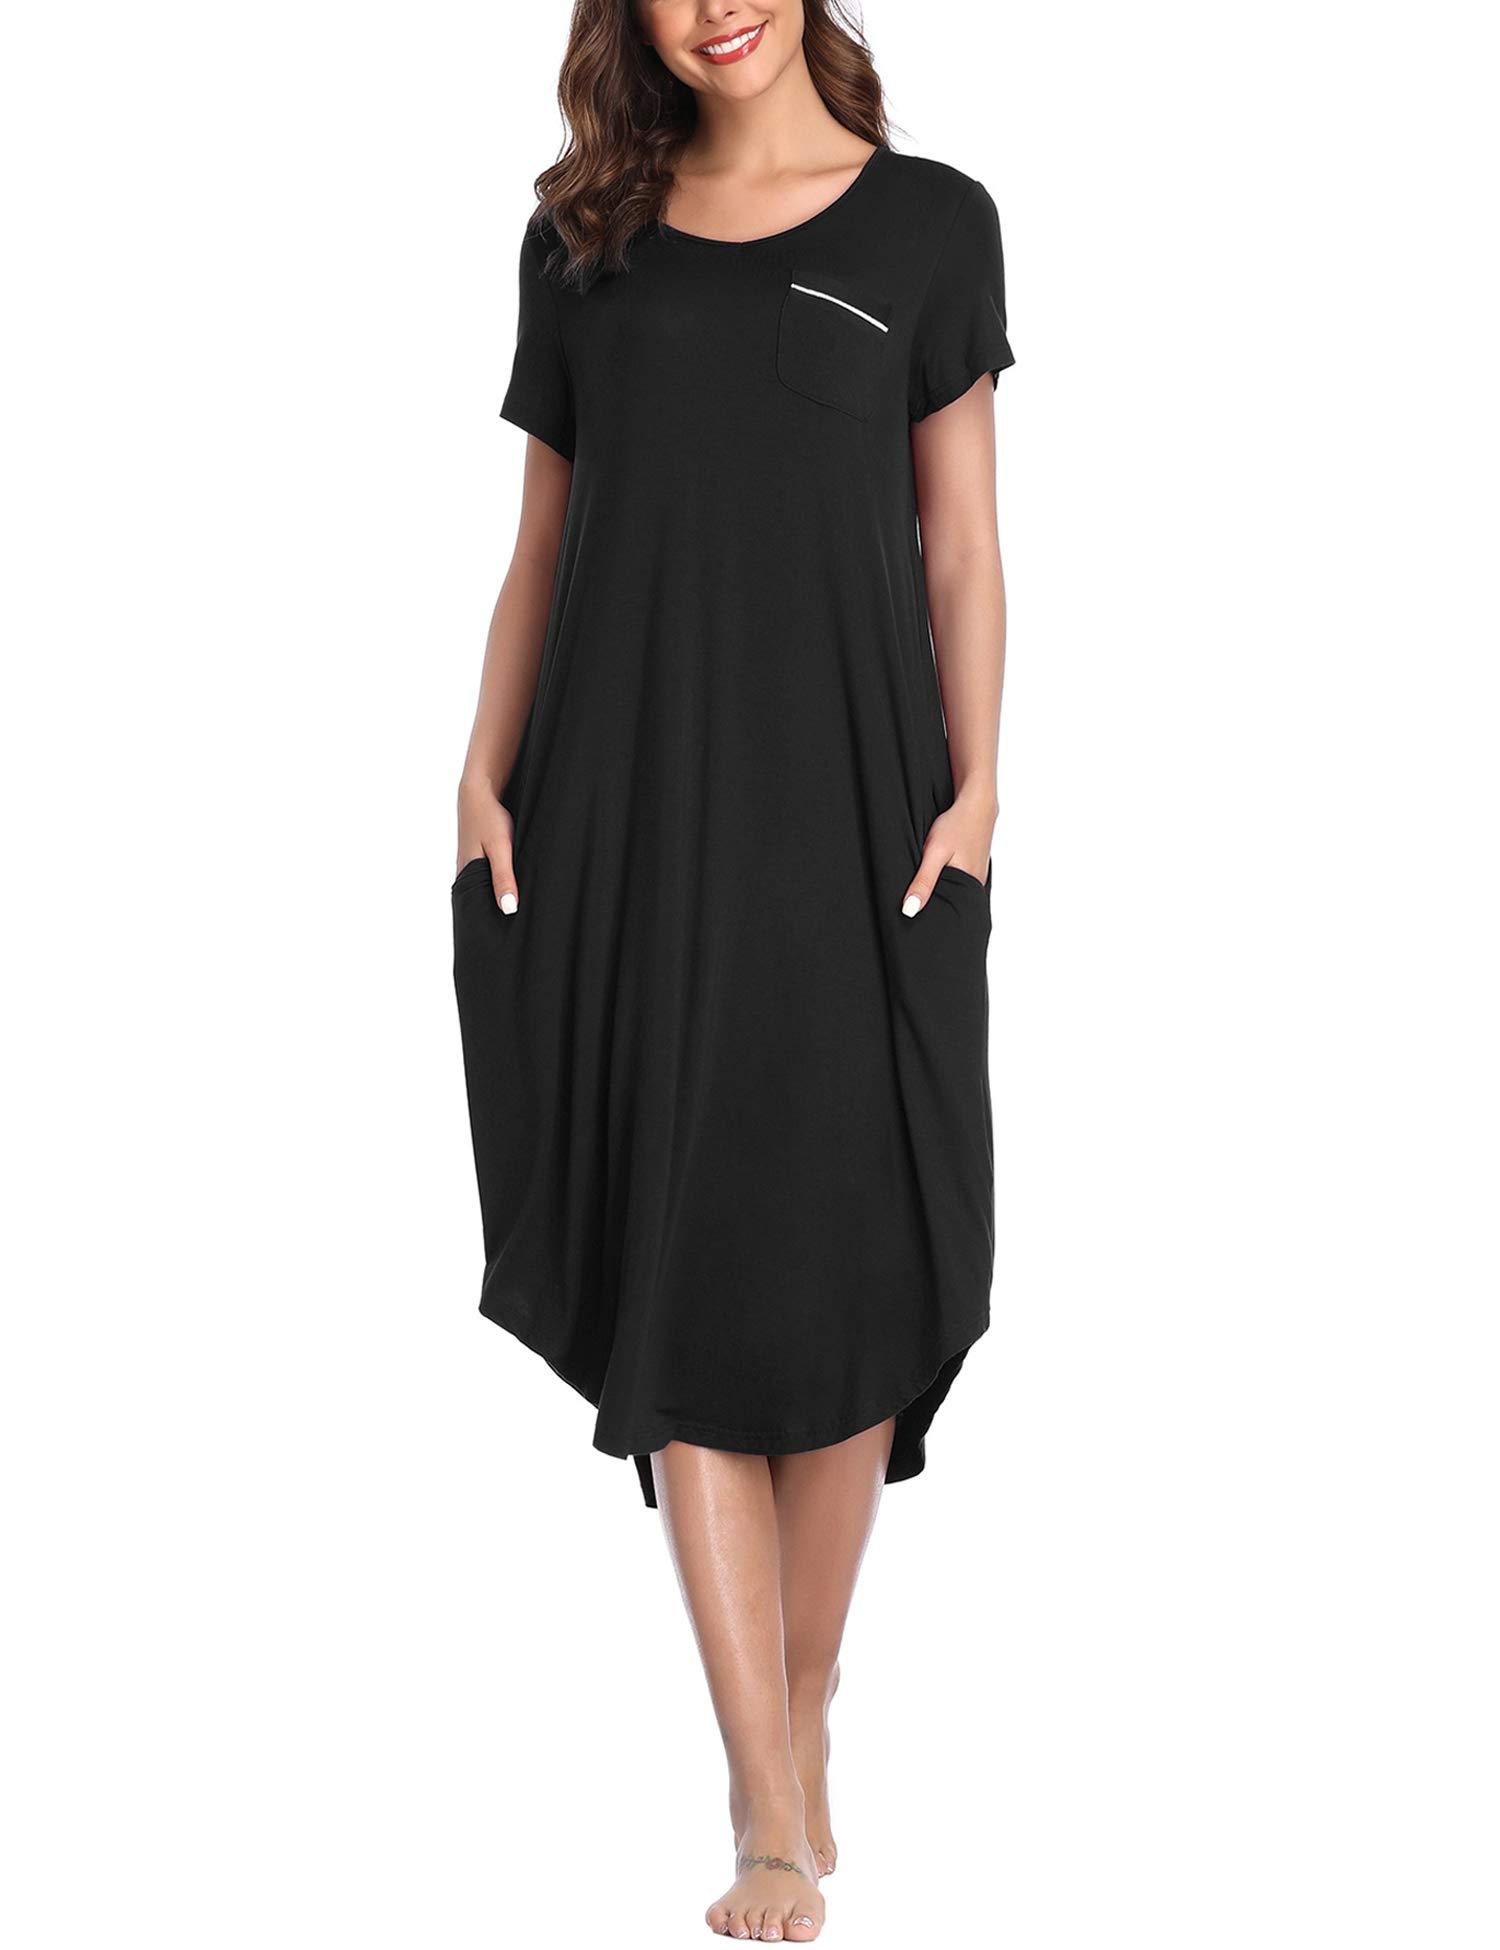 Lusofie Sleepwear Women Short Sleeve Nightgown V Neck Night Shirt Soft Sleep Dress with Pockets